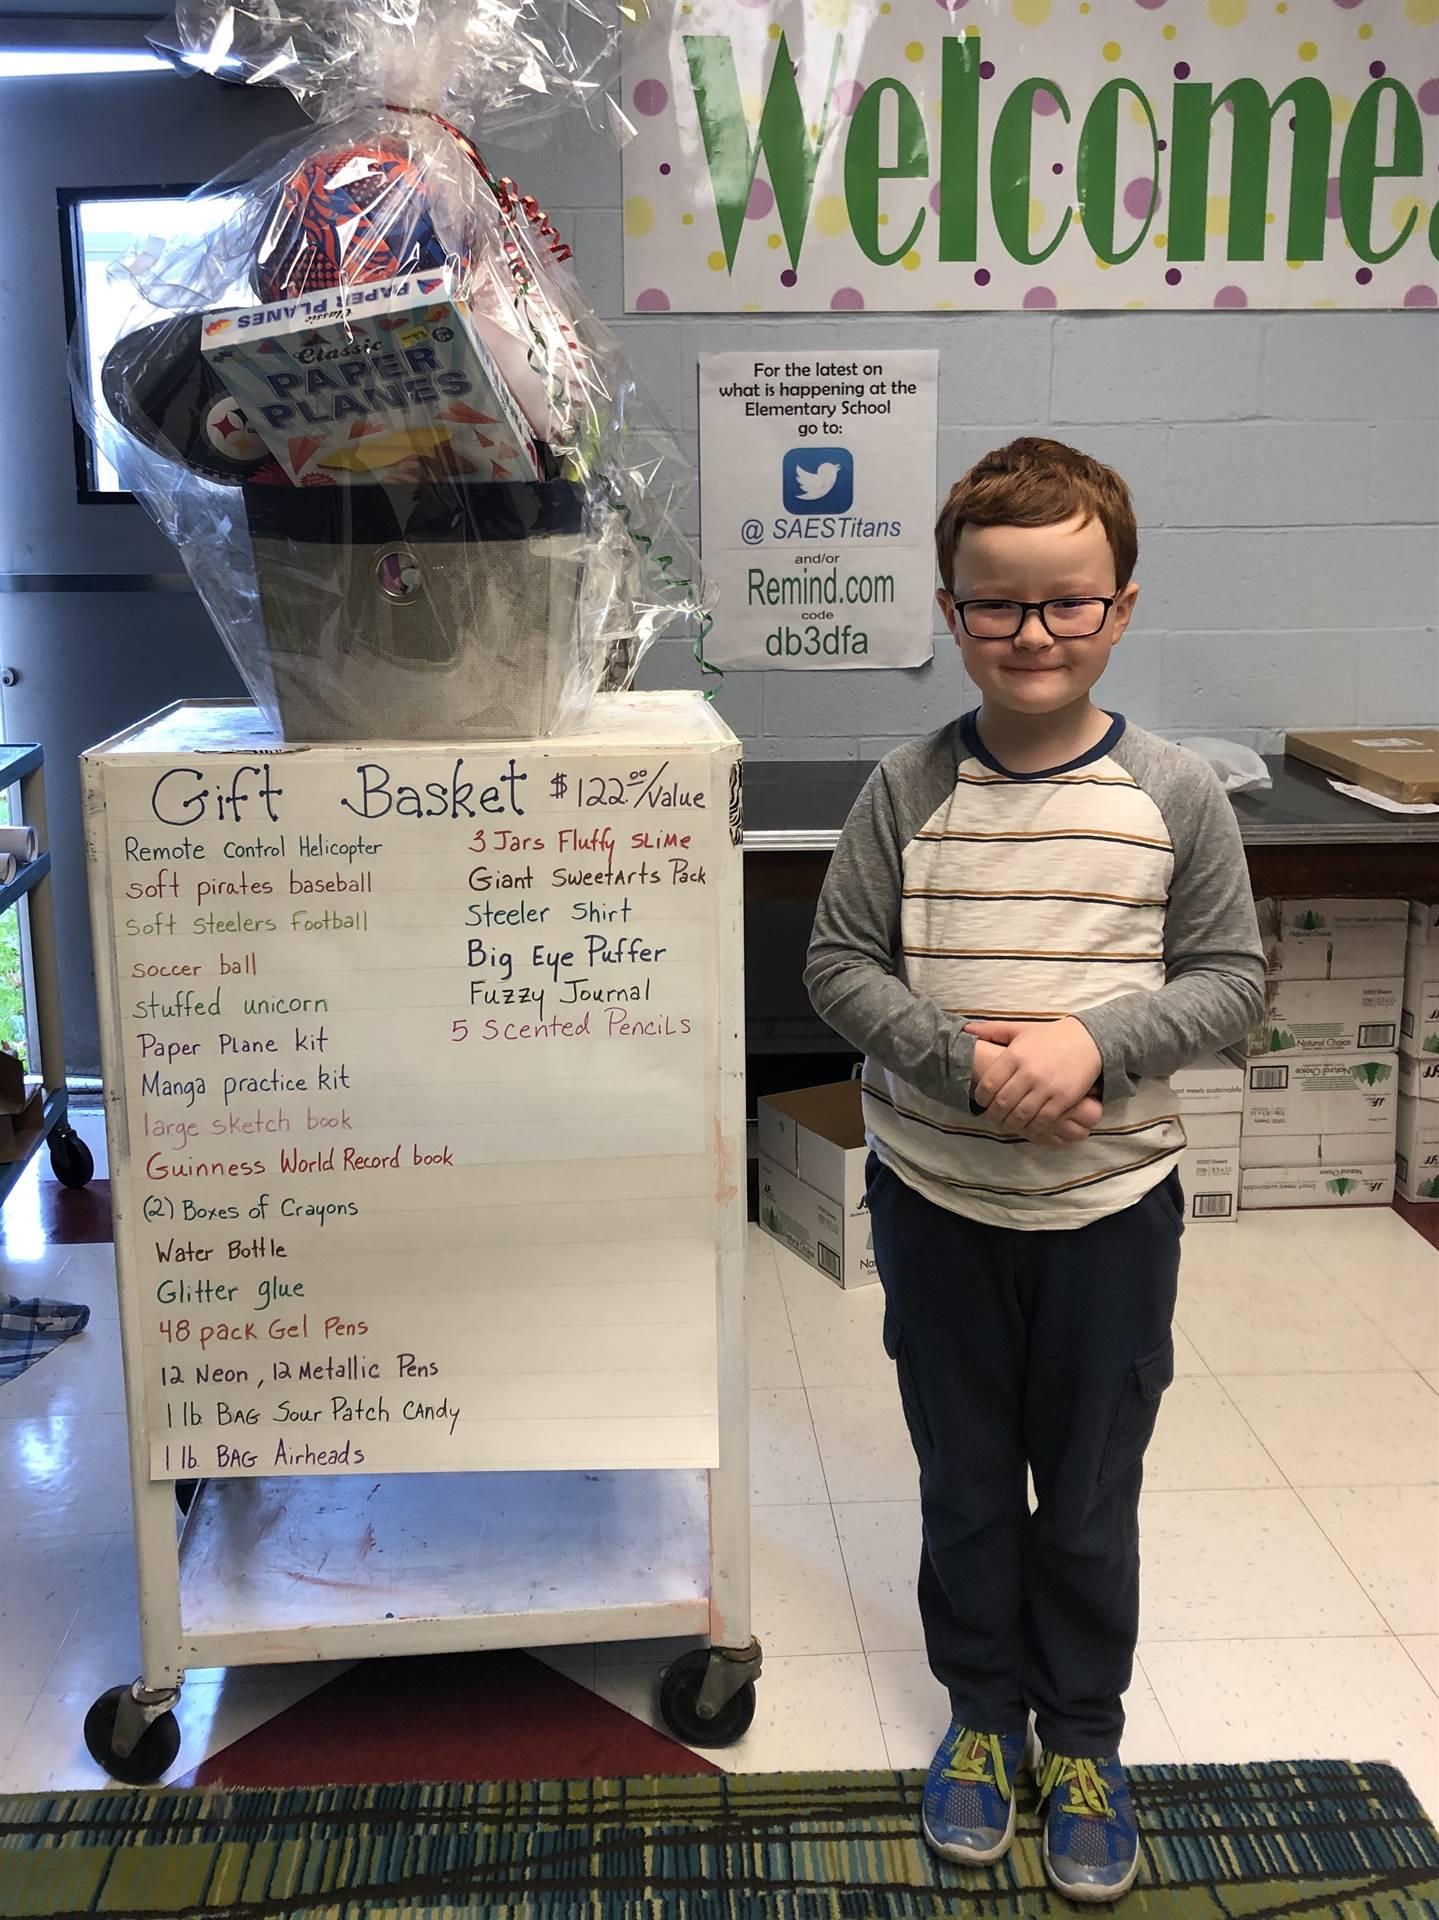 4th grader won the gift basket